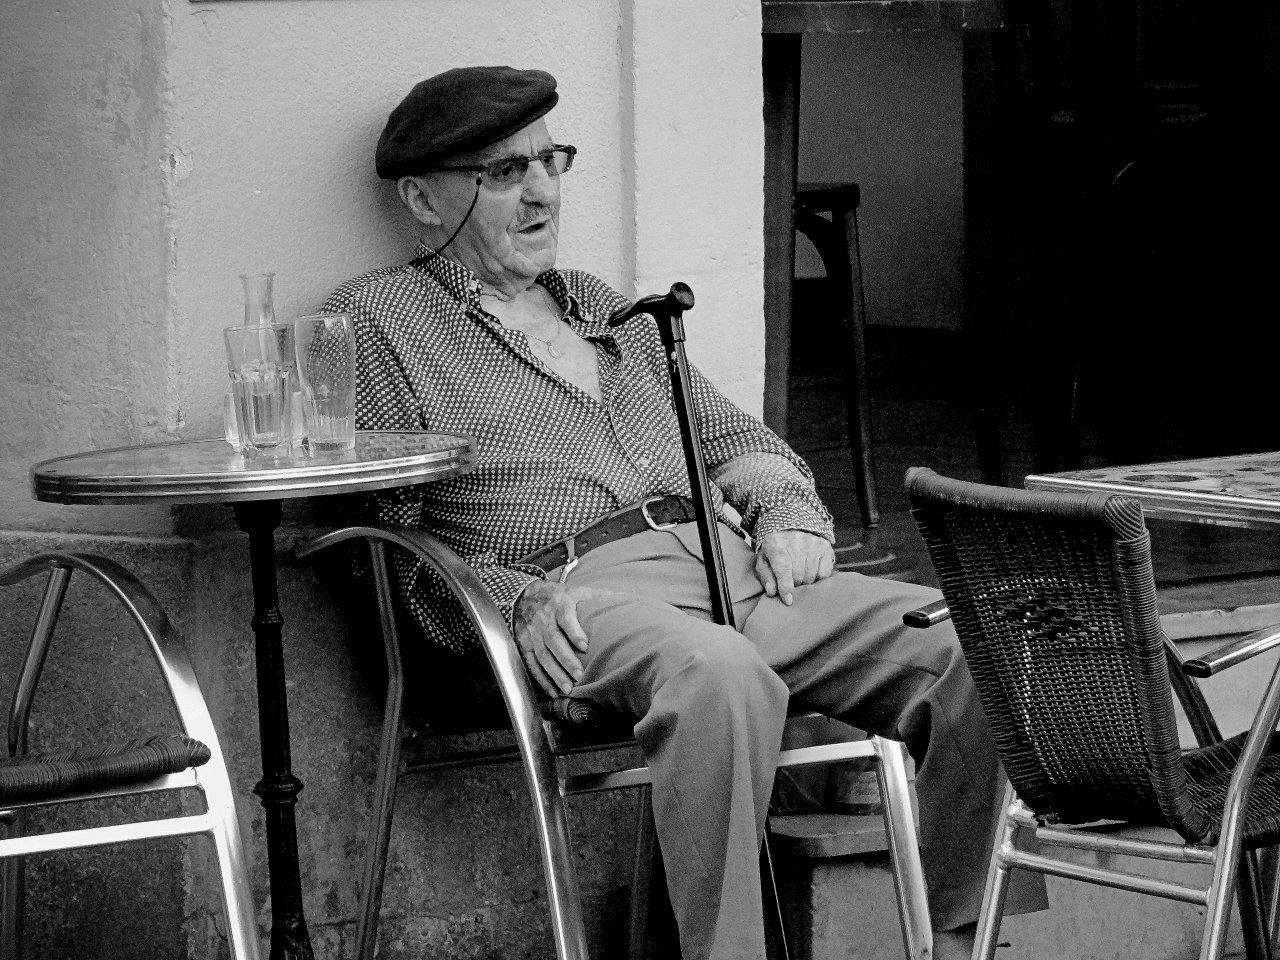 A seated man by Matteo Venturini